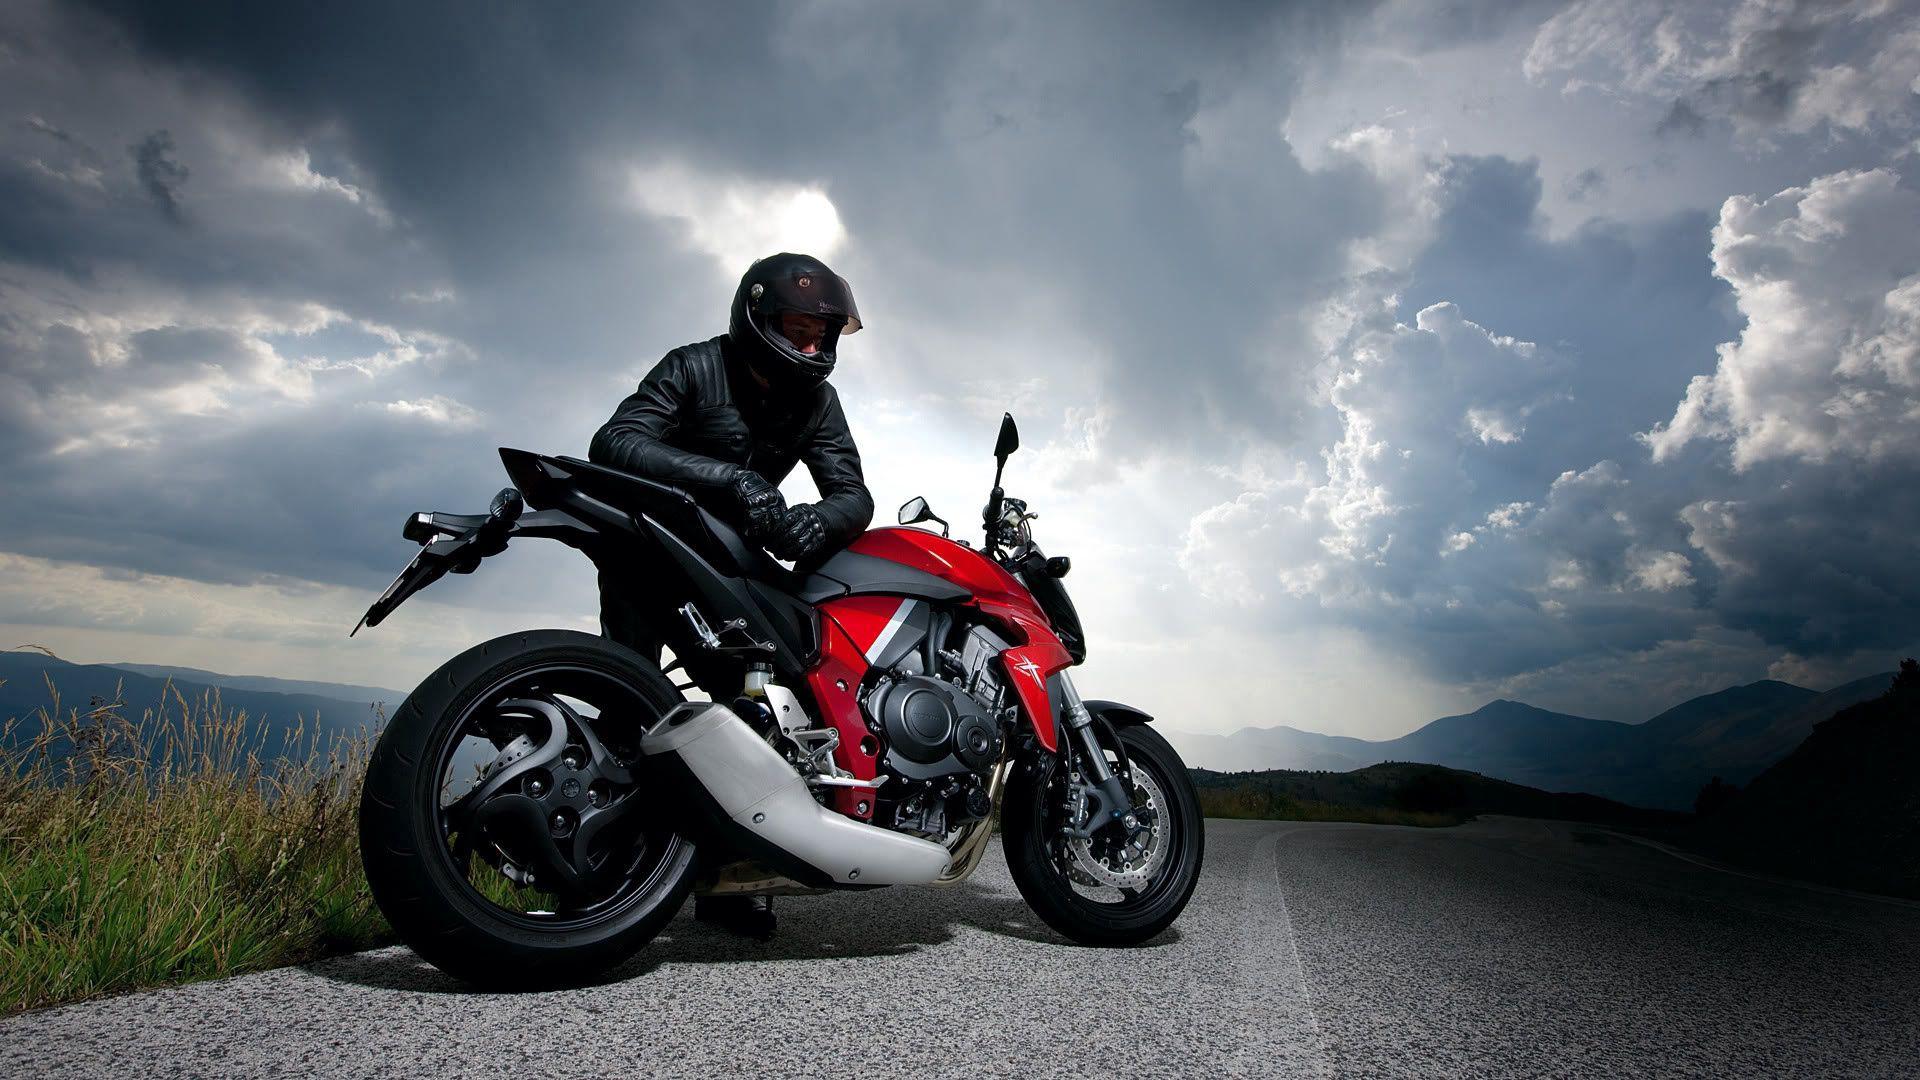 124331 скачать обои Мотоциклы, Мотоцикл, Гонщик, Дорога, Небо, Облака - заставки и картинки бесплатно